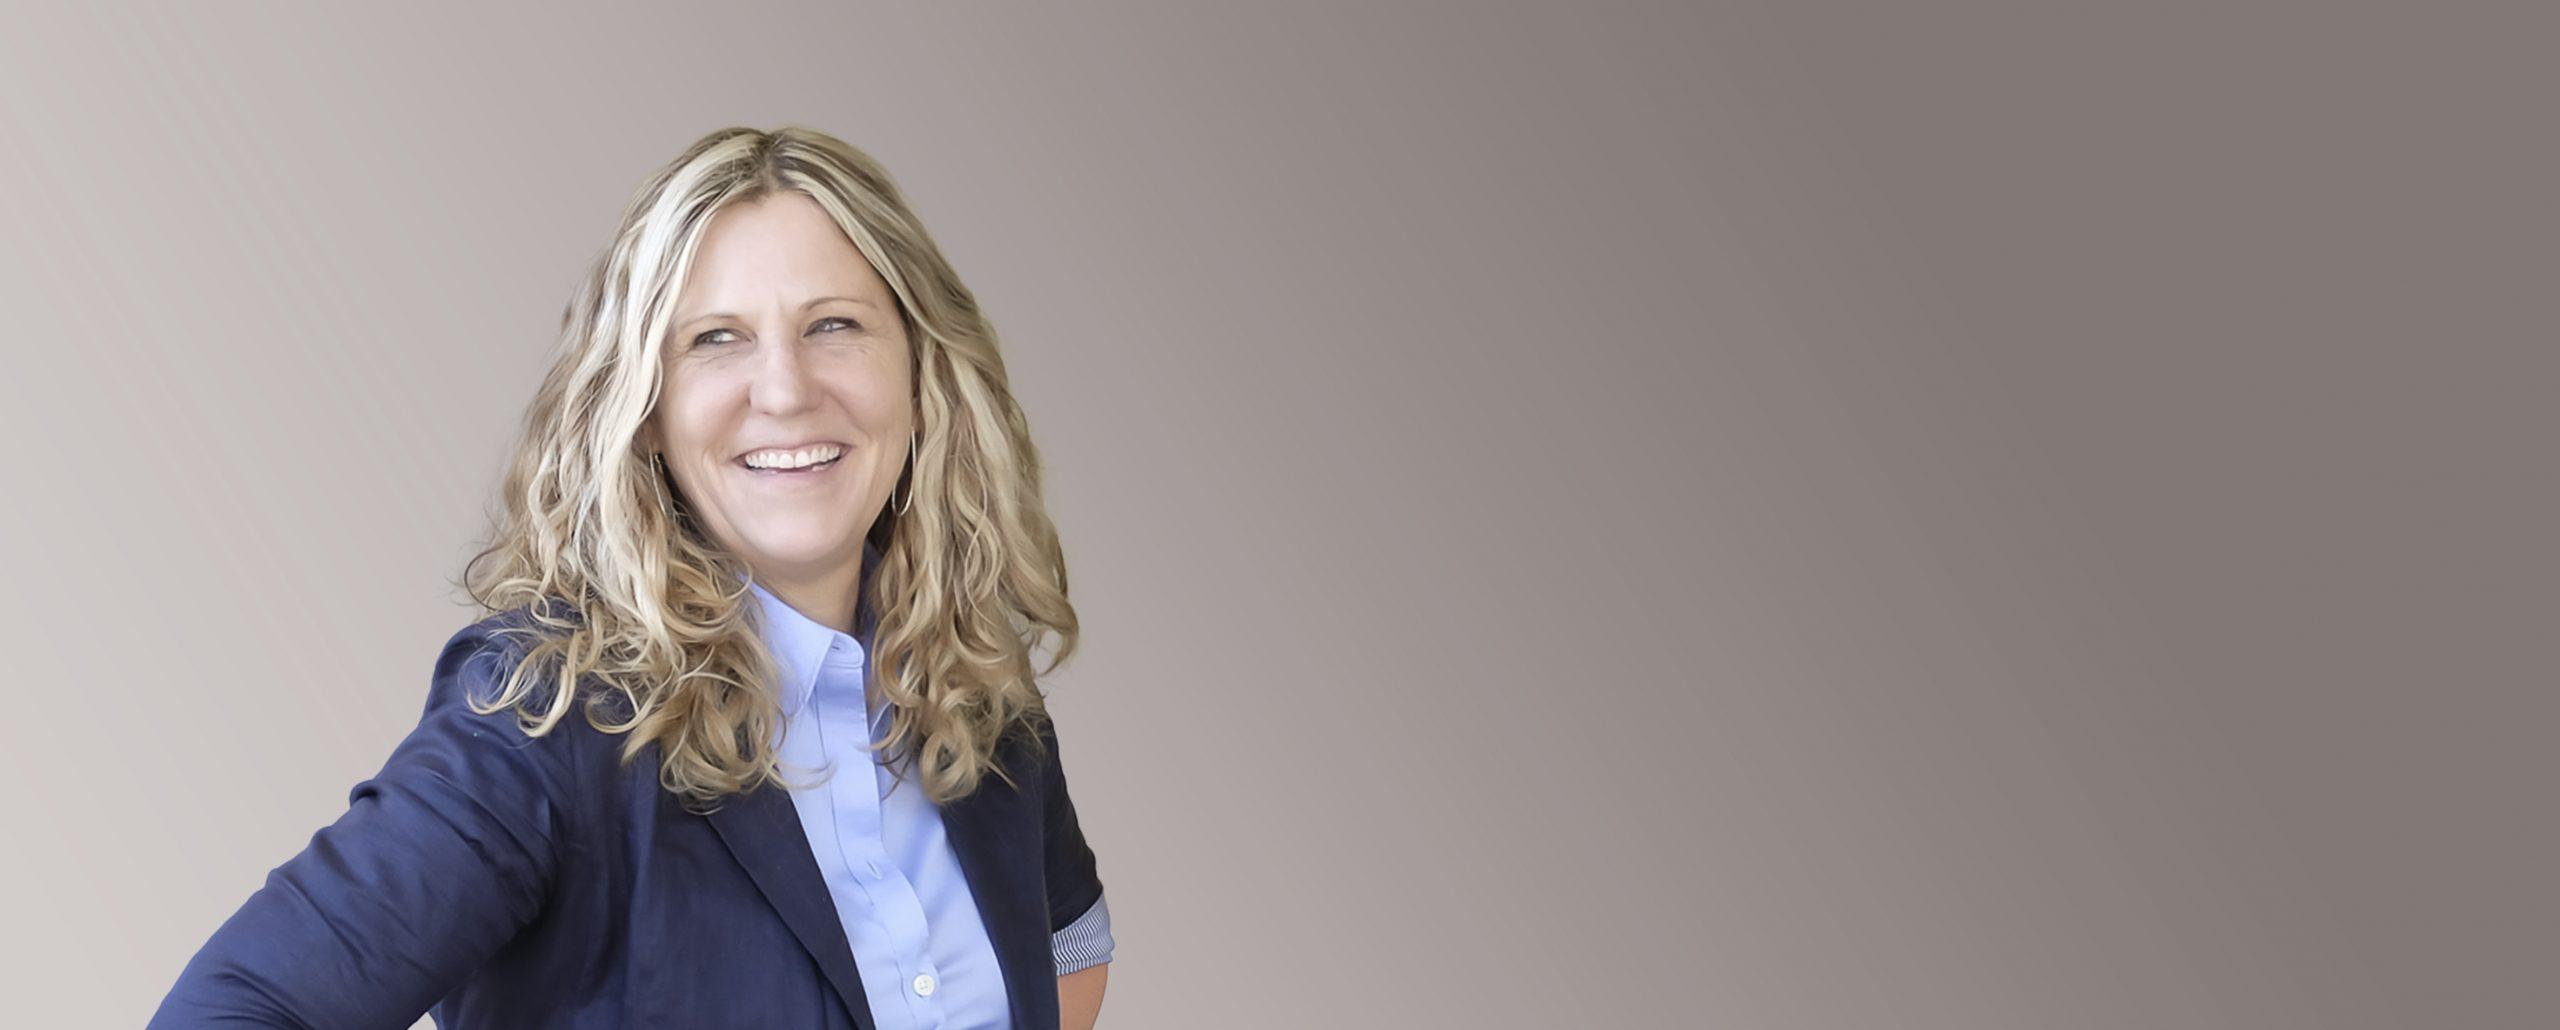 Q&A With Hirsch Bedner Associates Partner Kathleen Dauber